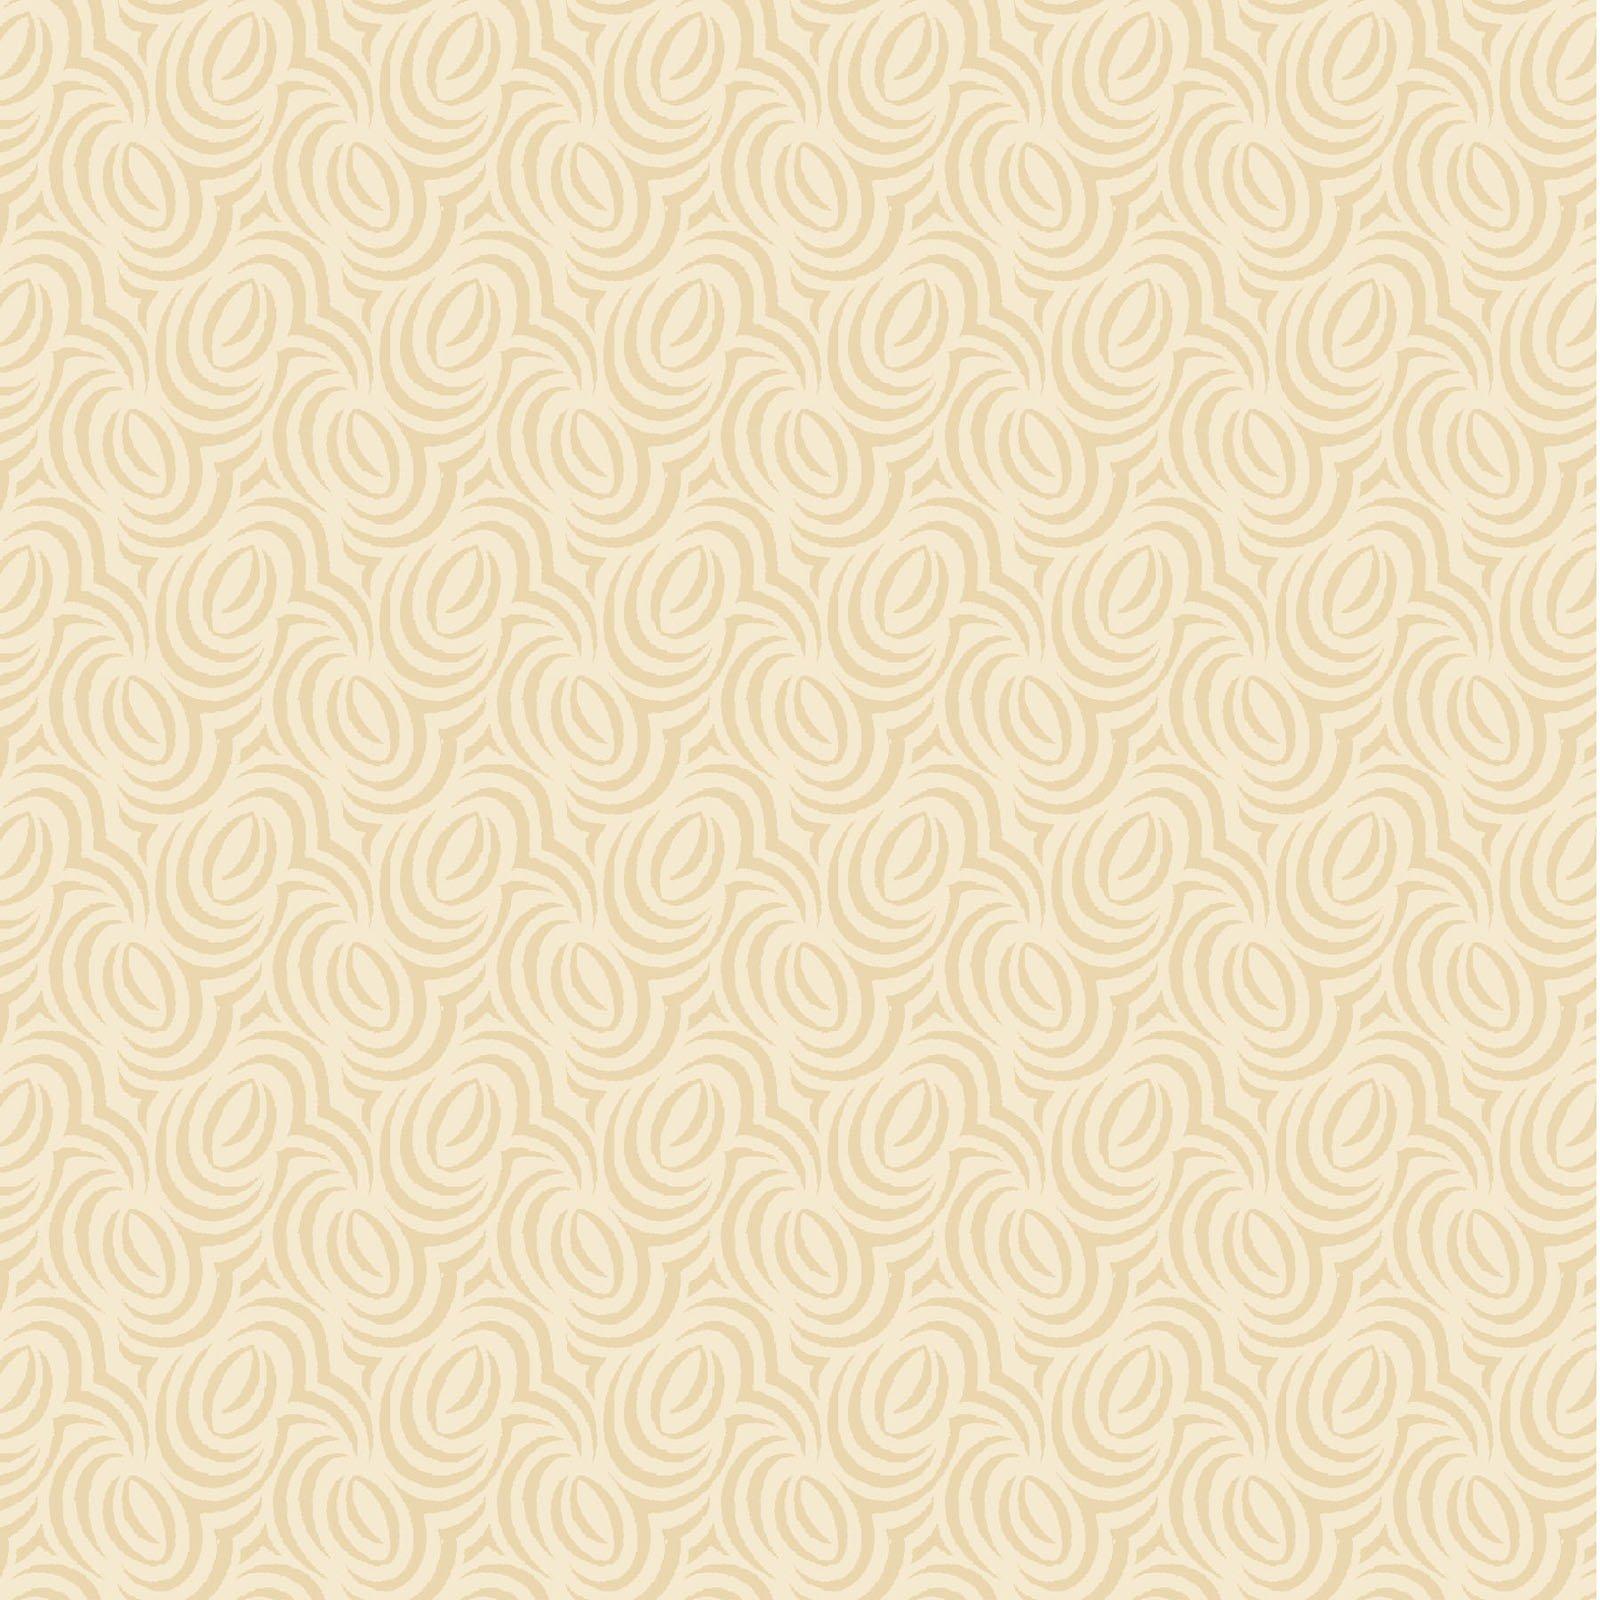 AC17-3137 W - APPLE CIDER 17 BY P&B BOUTIQUE GEO WHITE